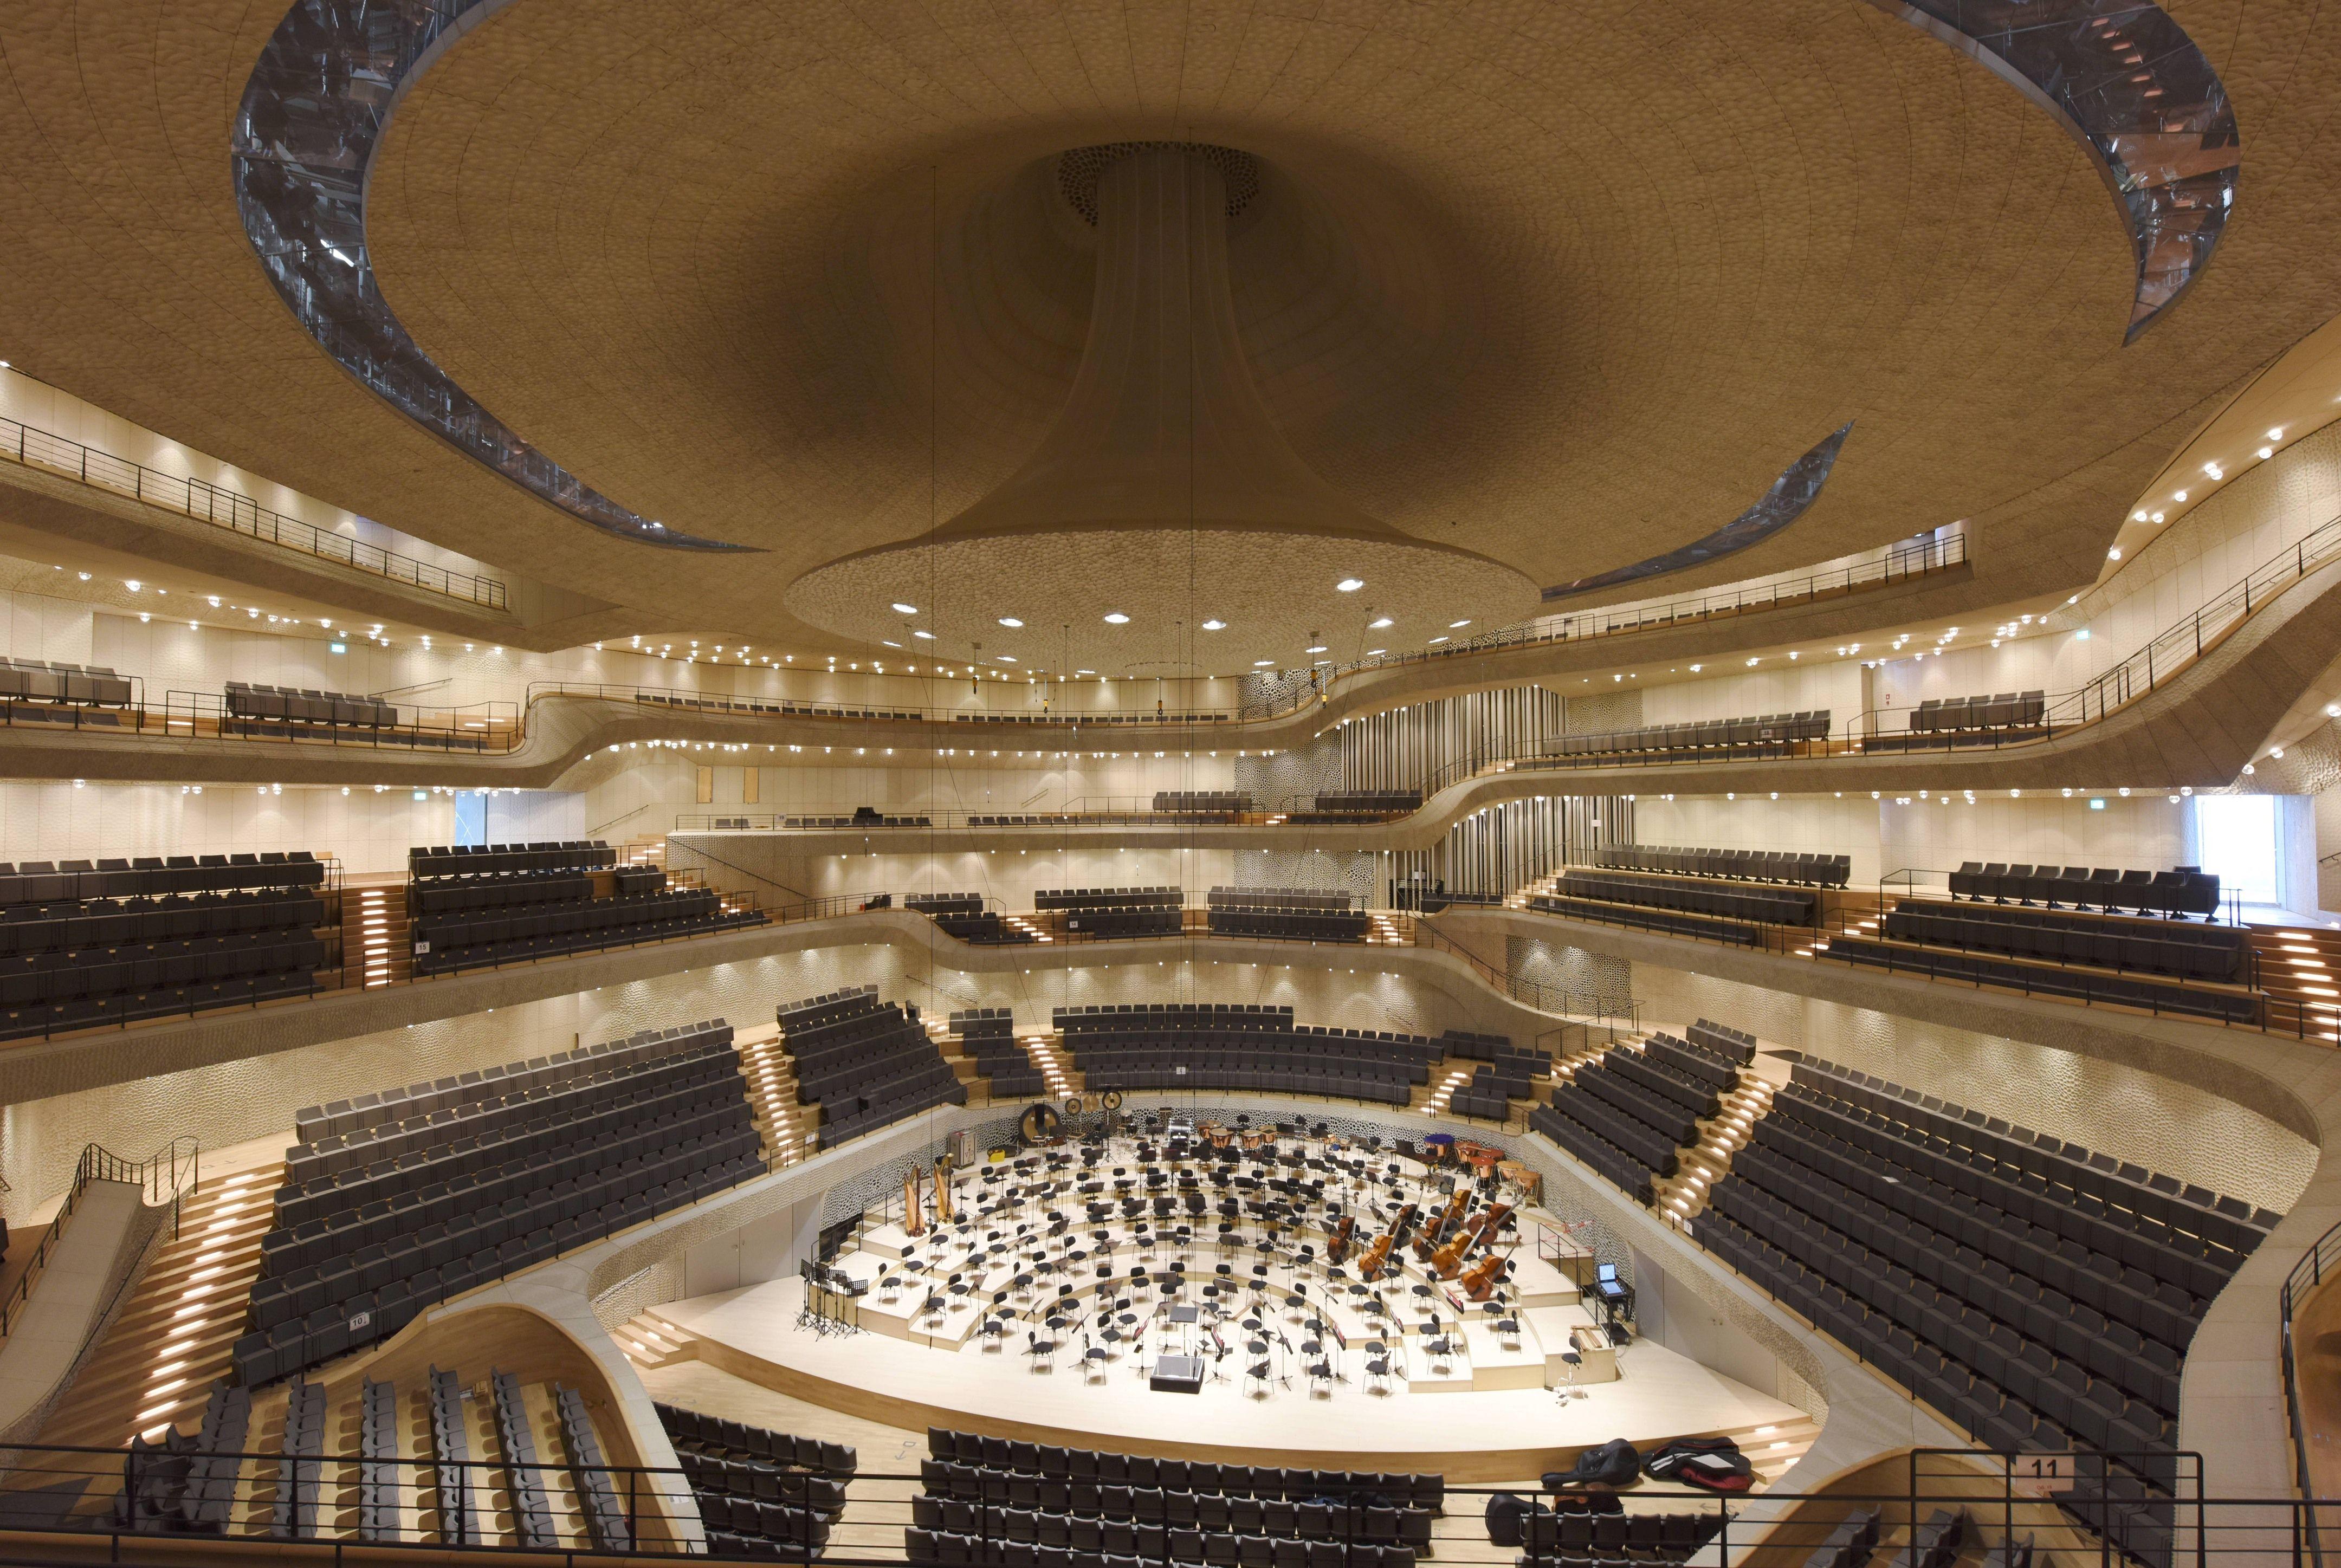 Elbphilharmonie Picture Gallery